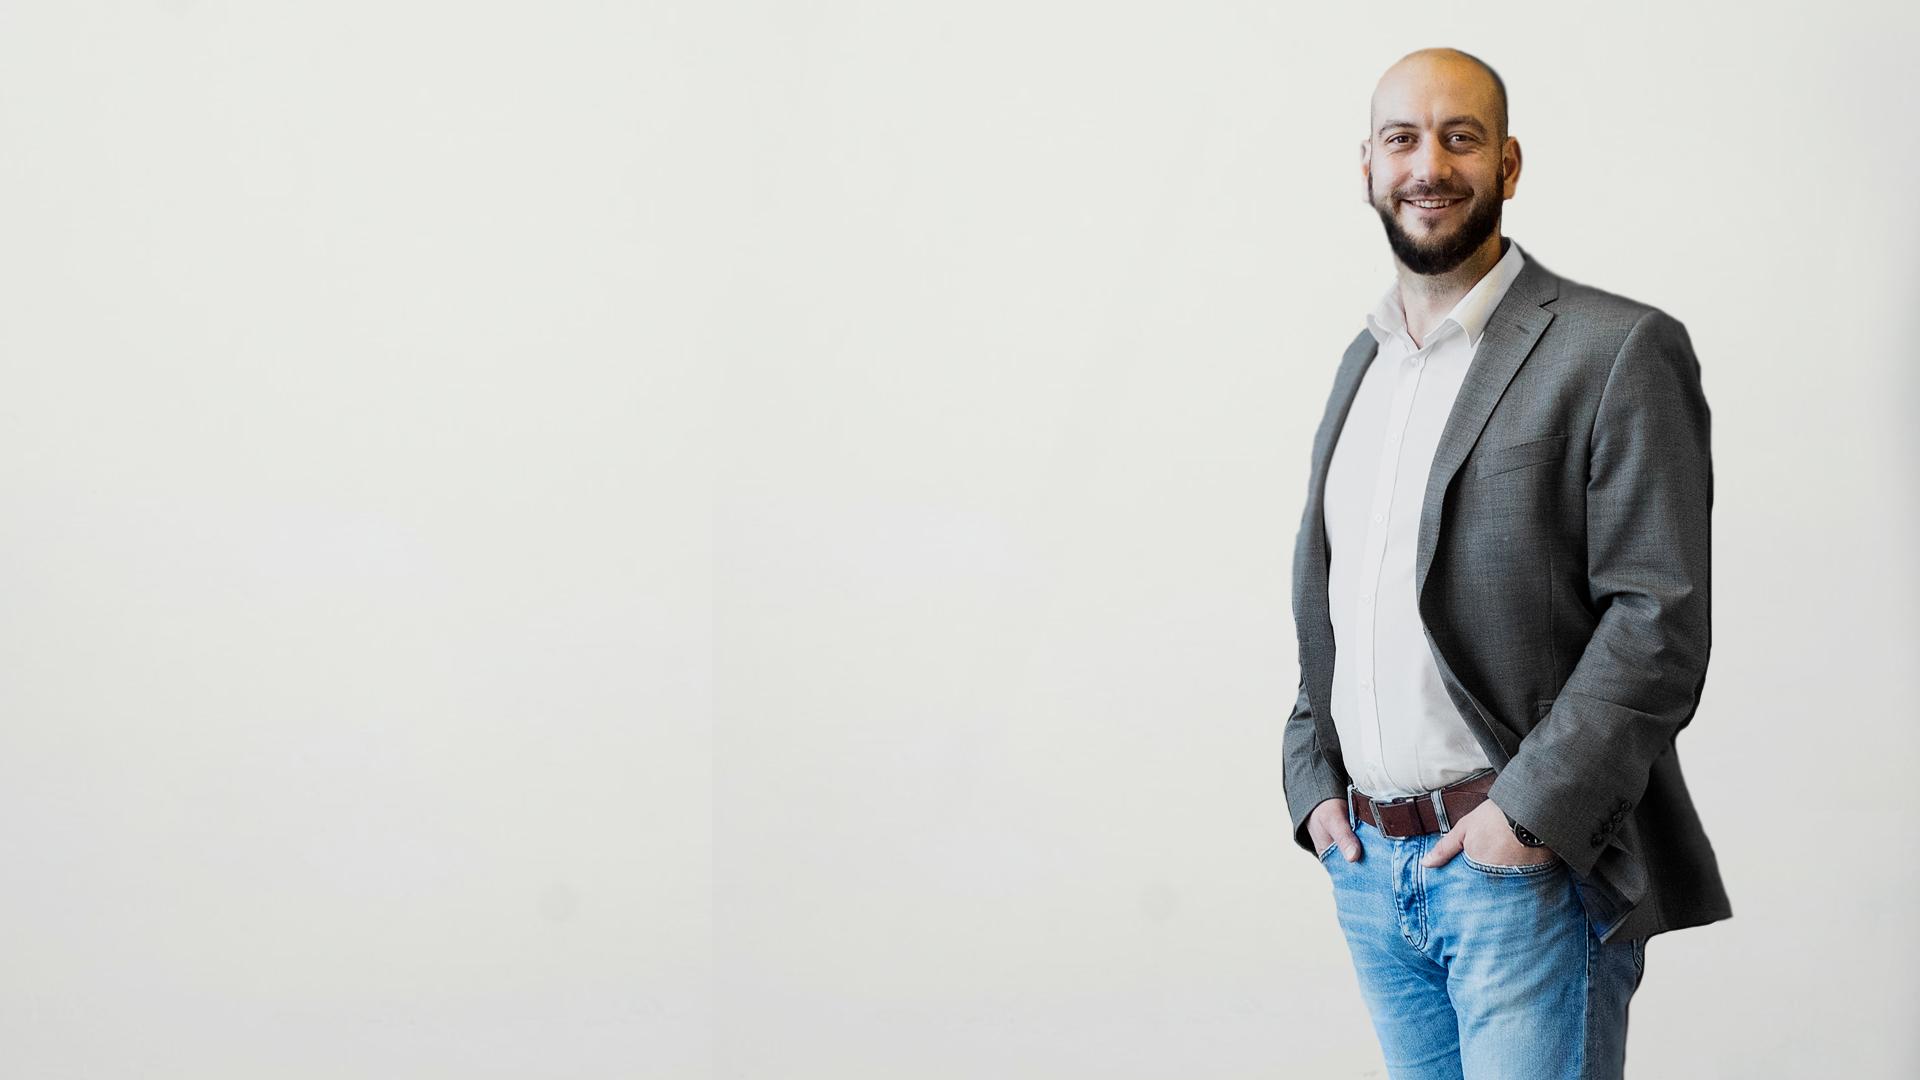 a profile image of Konstantinos Milonidis